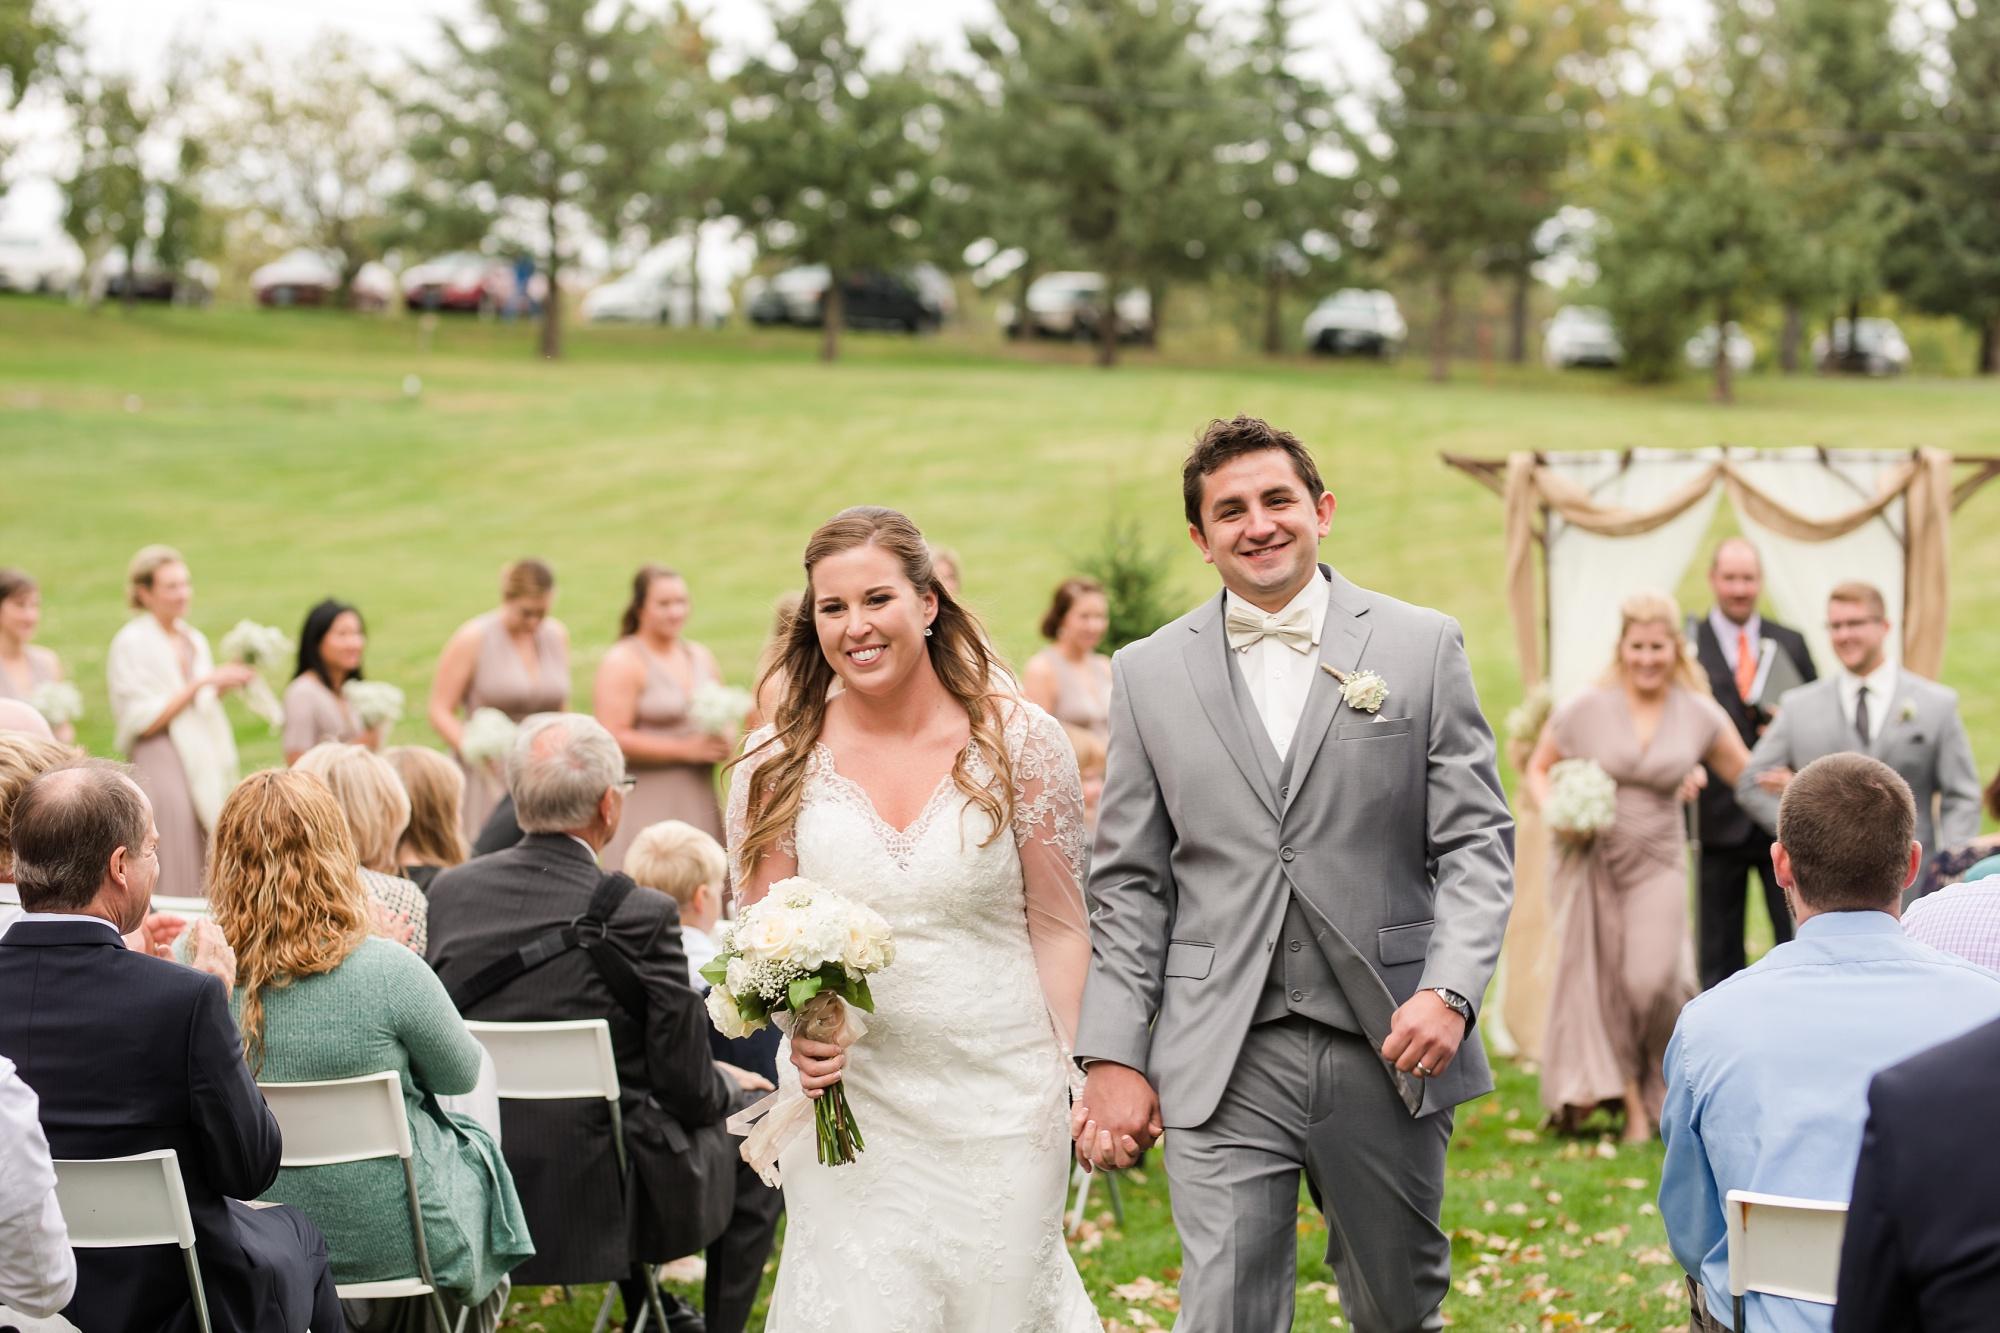 AmberLangerudPhotography_Fair Hills Resort Lakeside Wedding in Minnesota_3470.jpg